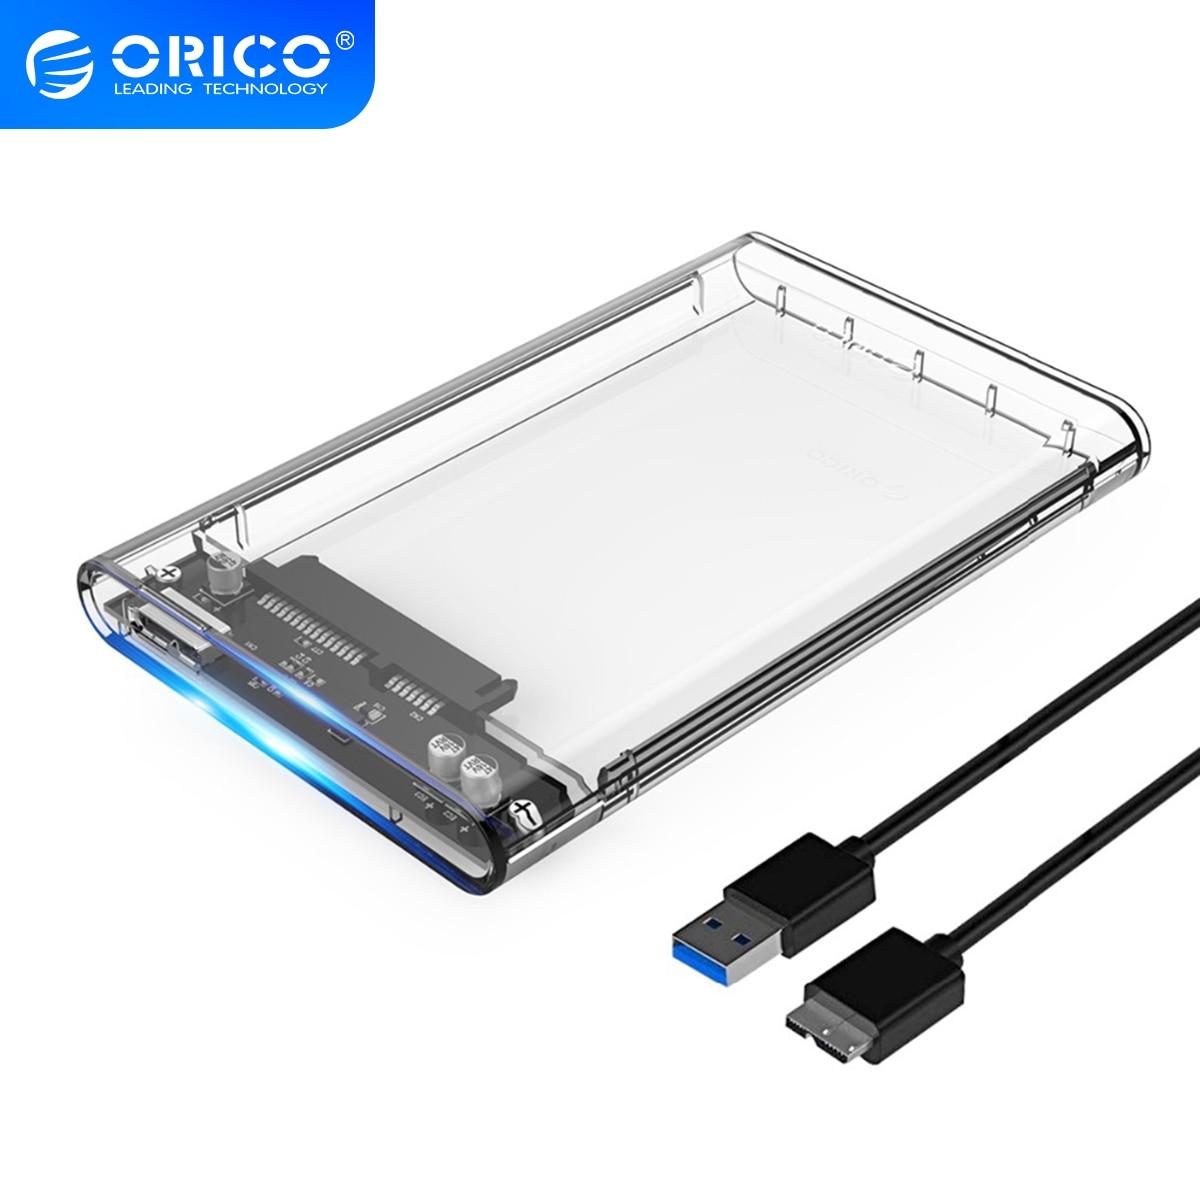 ORICO 2139U3 Hard Drive Enclosure 2.5 inch Transparent USB3.0 Support UASP Protocol for 7-9.5 mm HDD